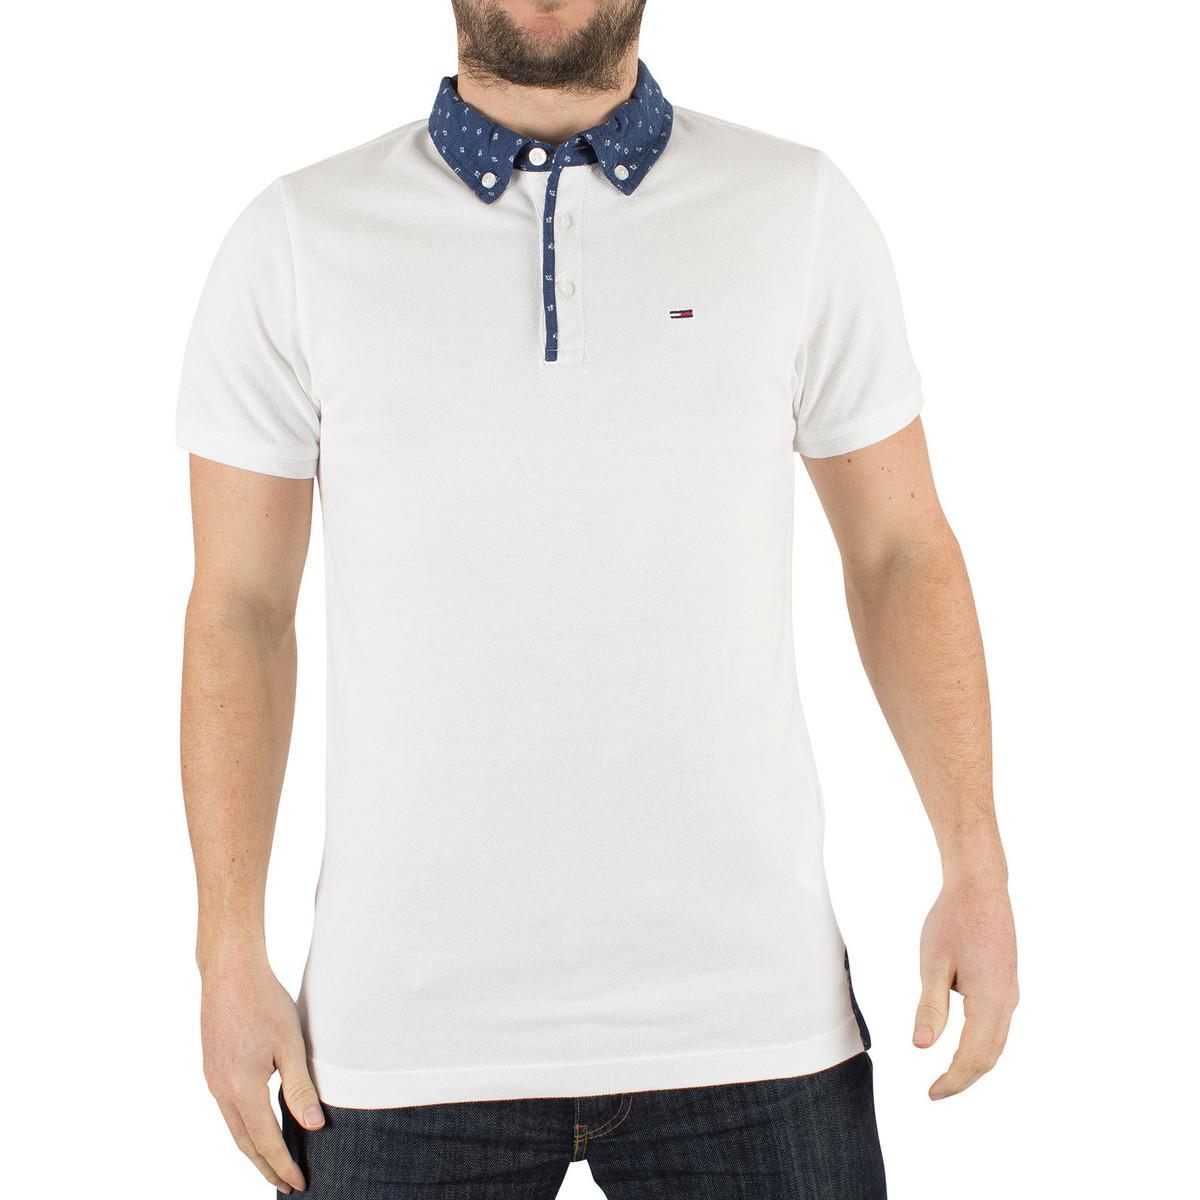 6aee25fdc Tommy Hilfiger Hilfiger Denim Men's Detail Button Down Logo Polo ...